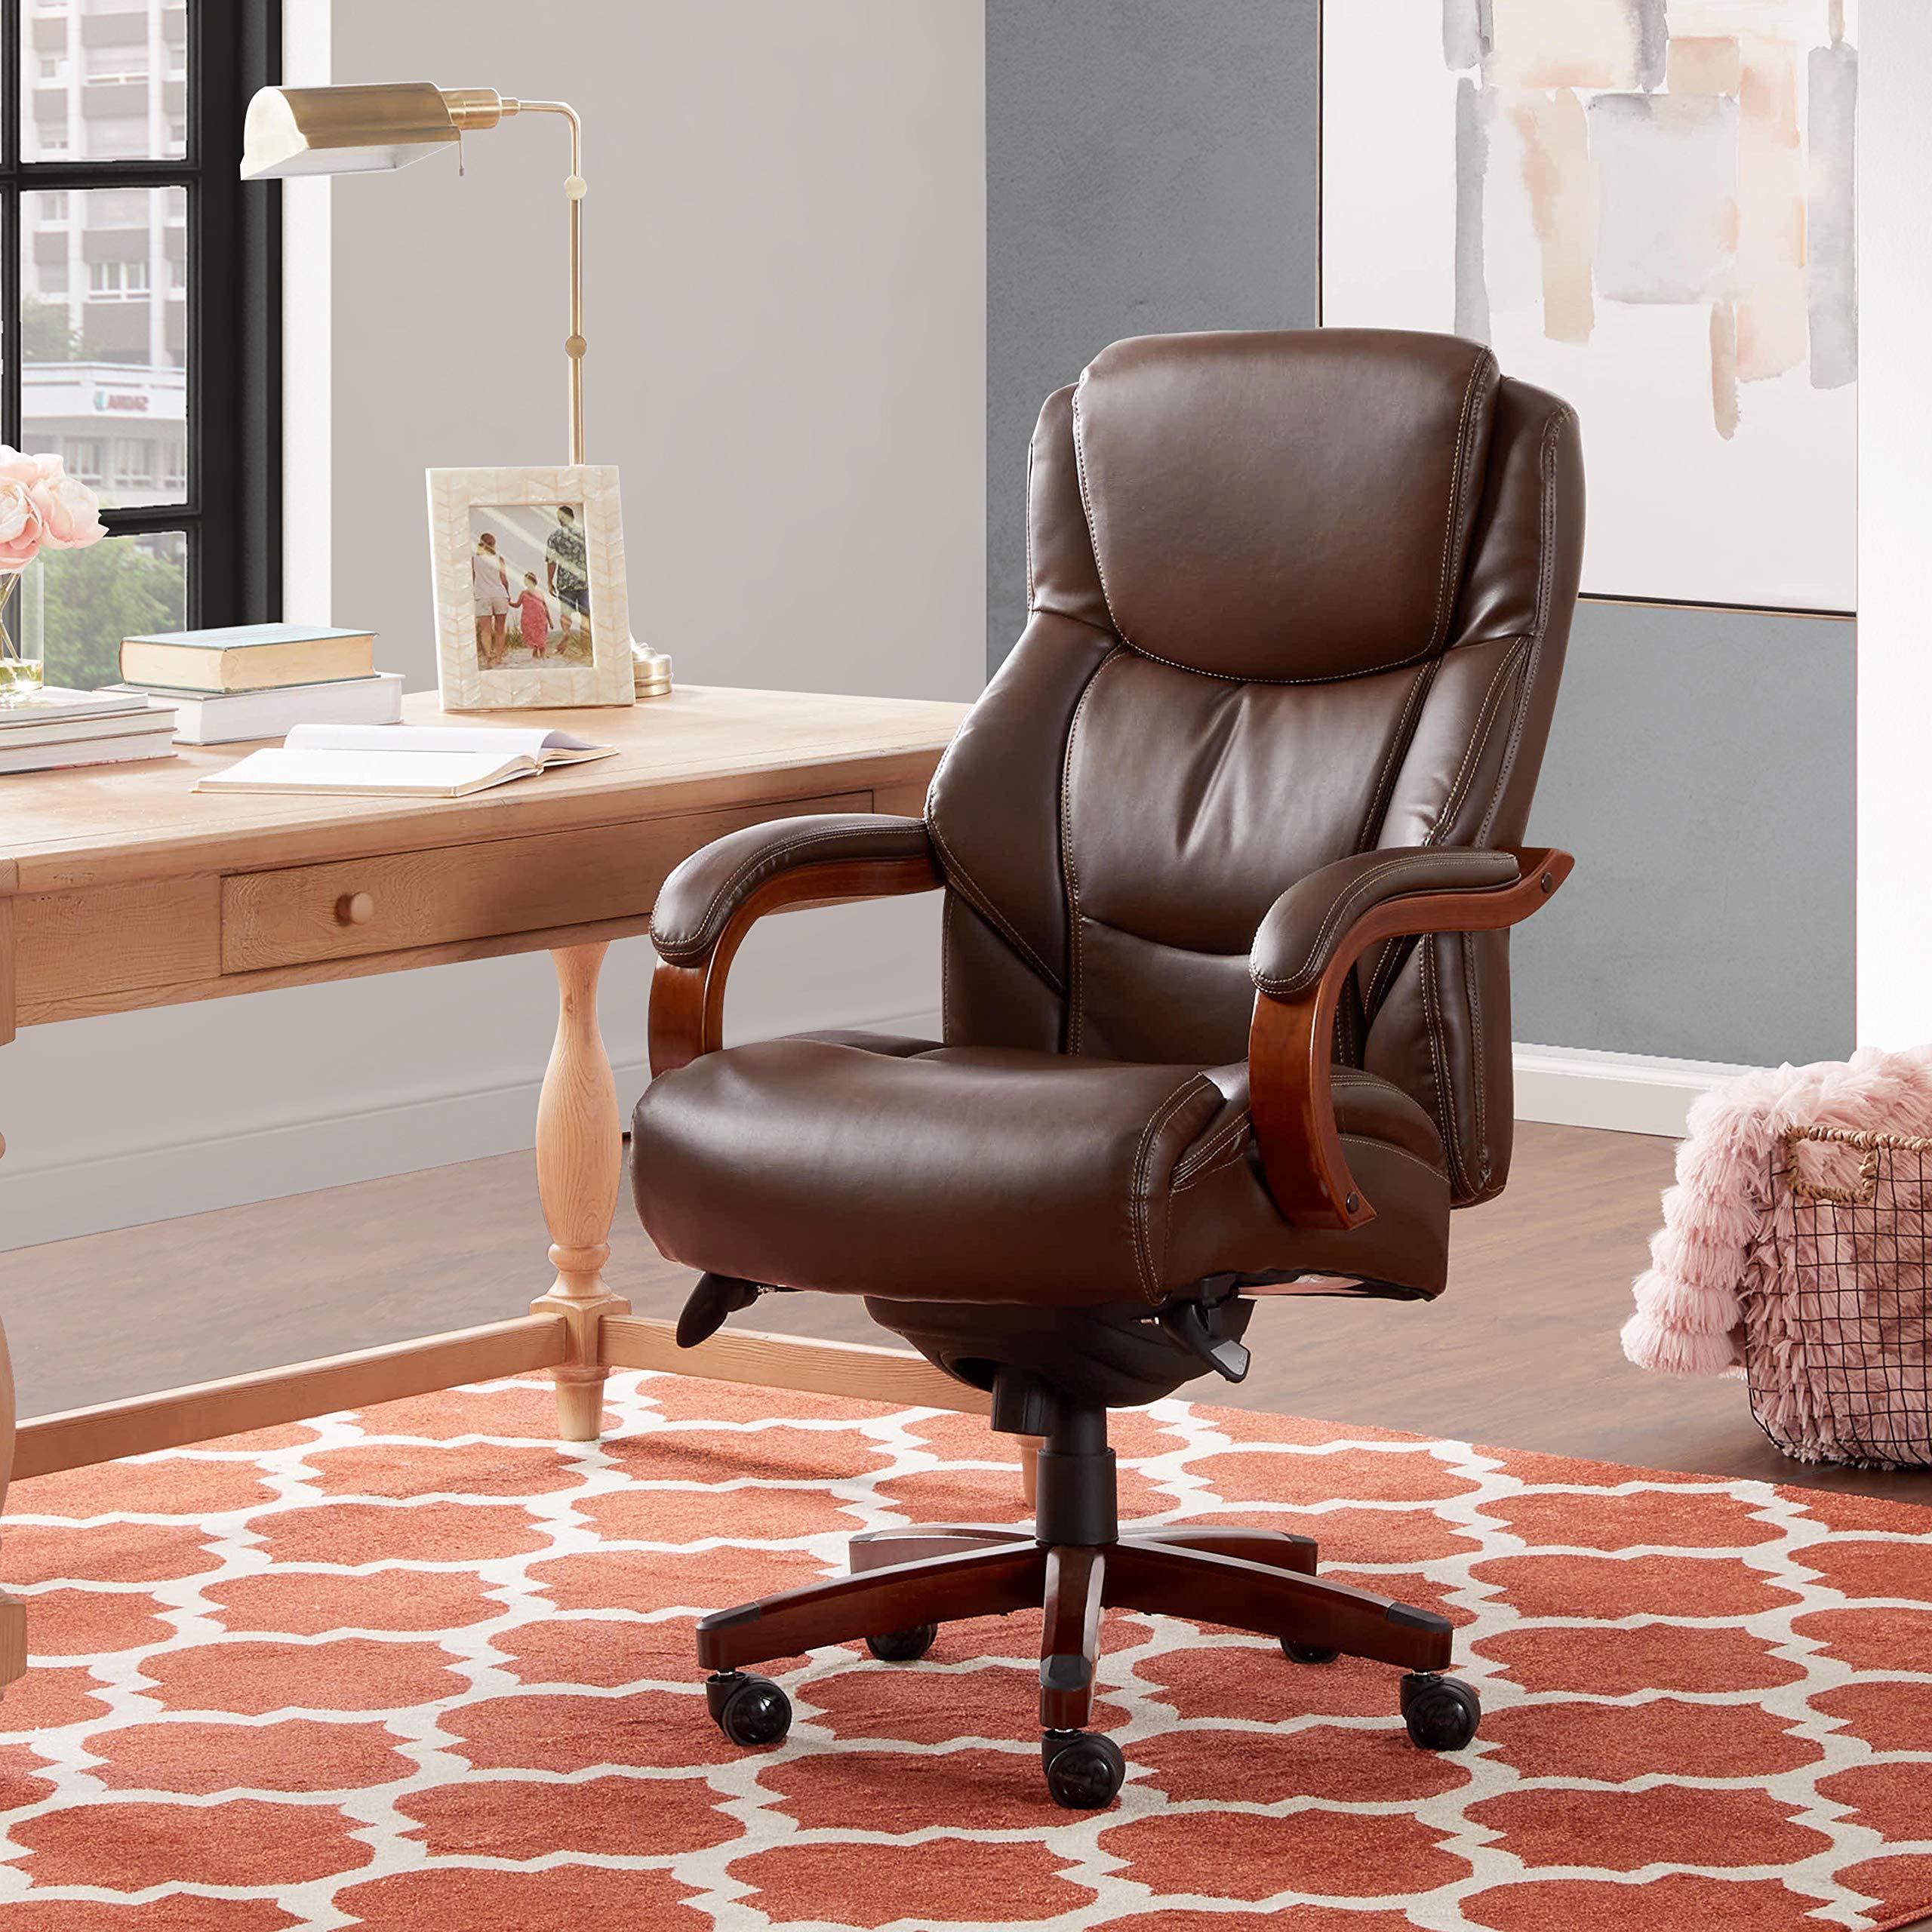 La-Z-Boy Delano Big & Tall Executive Bonded Leather Office Chair - Chestnut (Brown) by La-Z-Boy